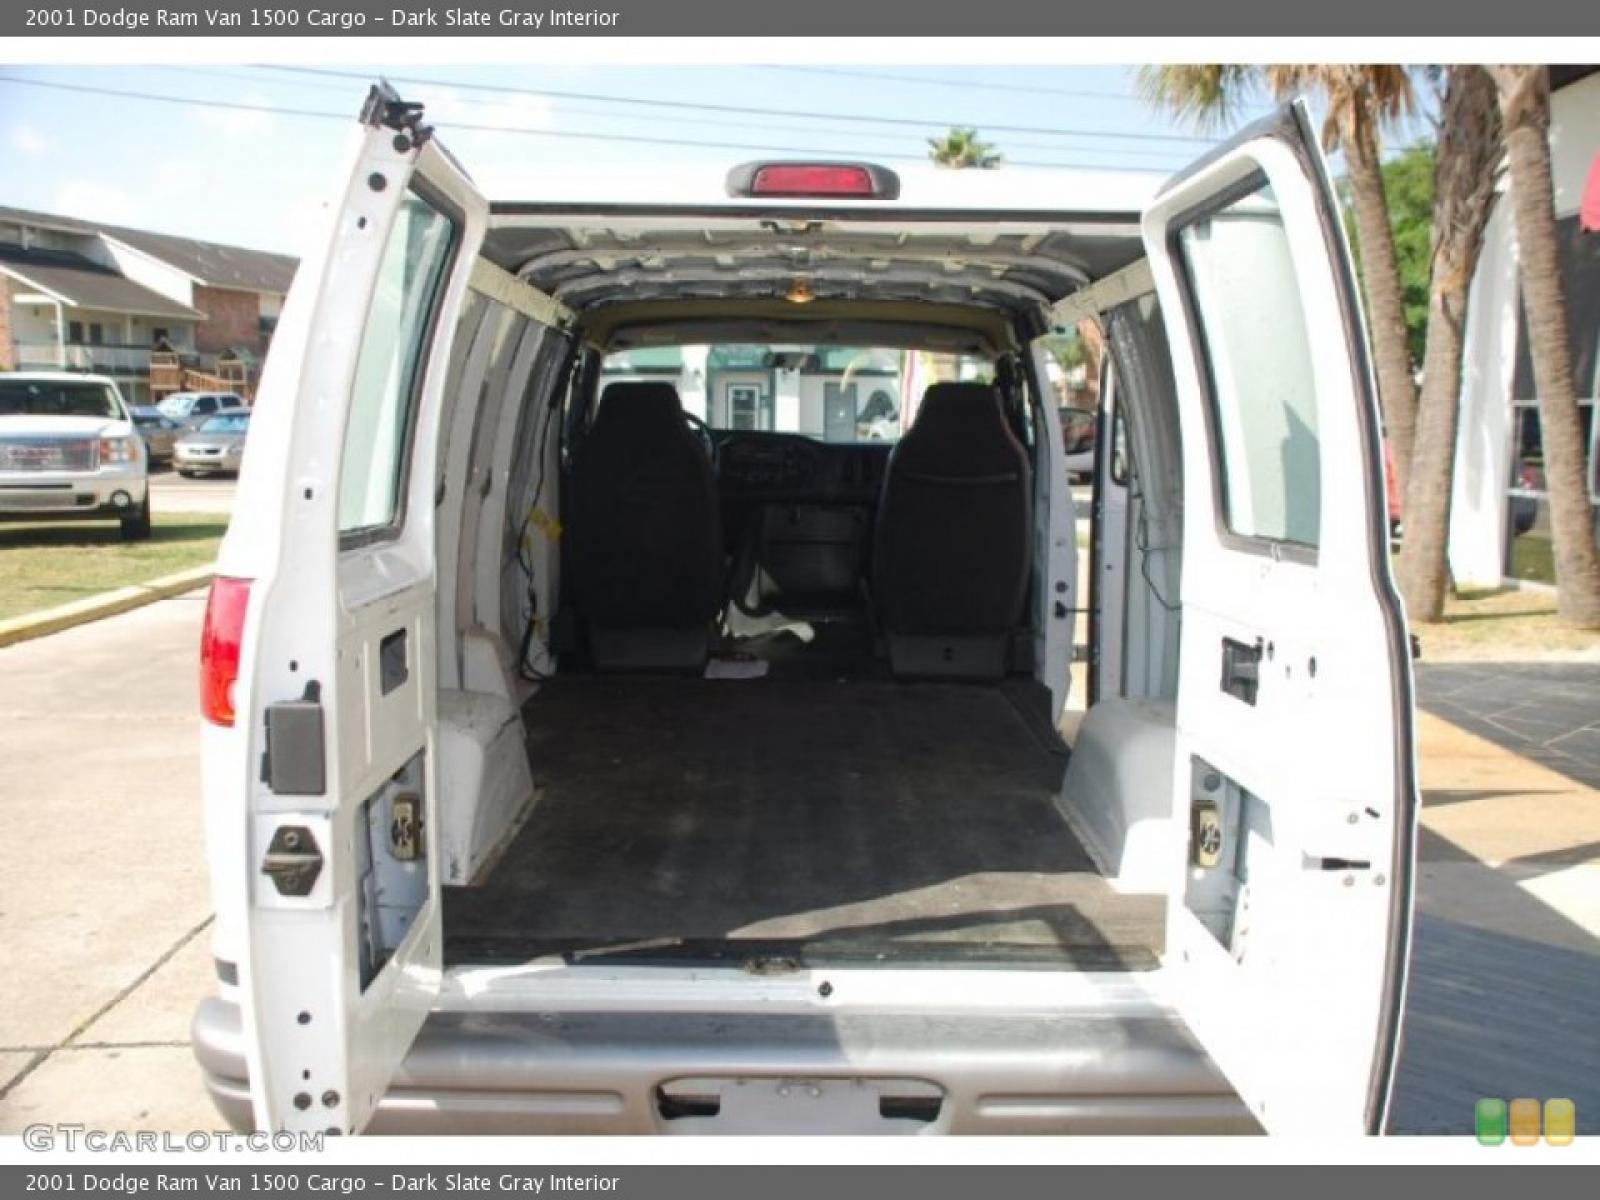 800 1024 1280 1600 Origin 2001 Dodge Ram Cargo